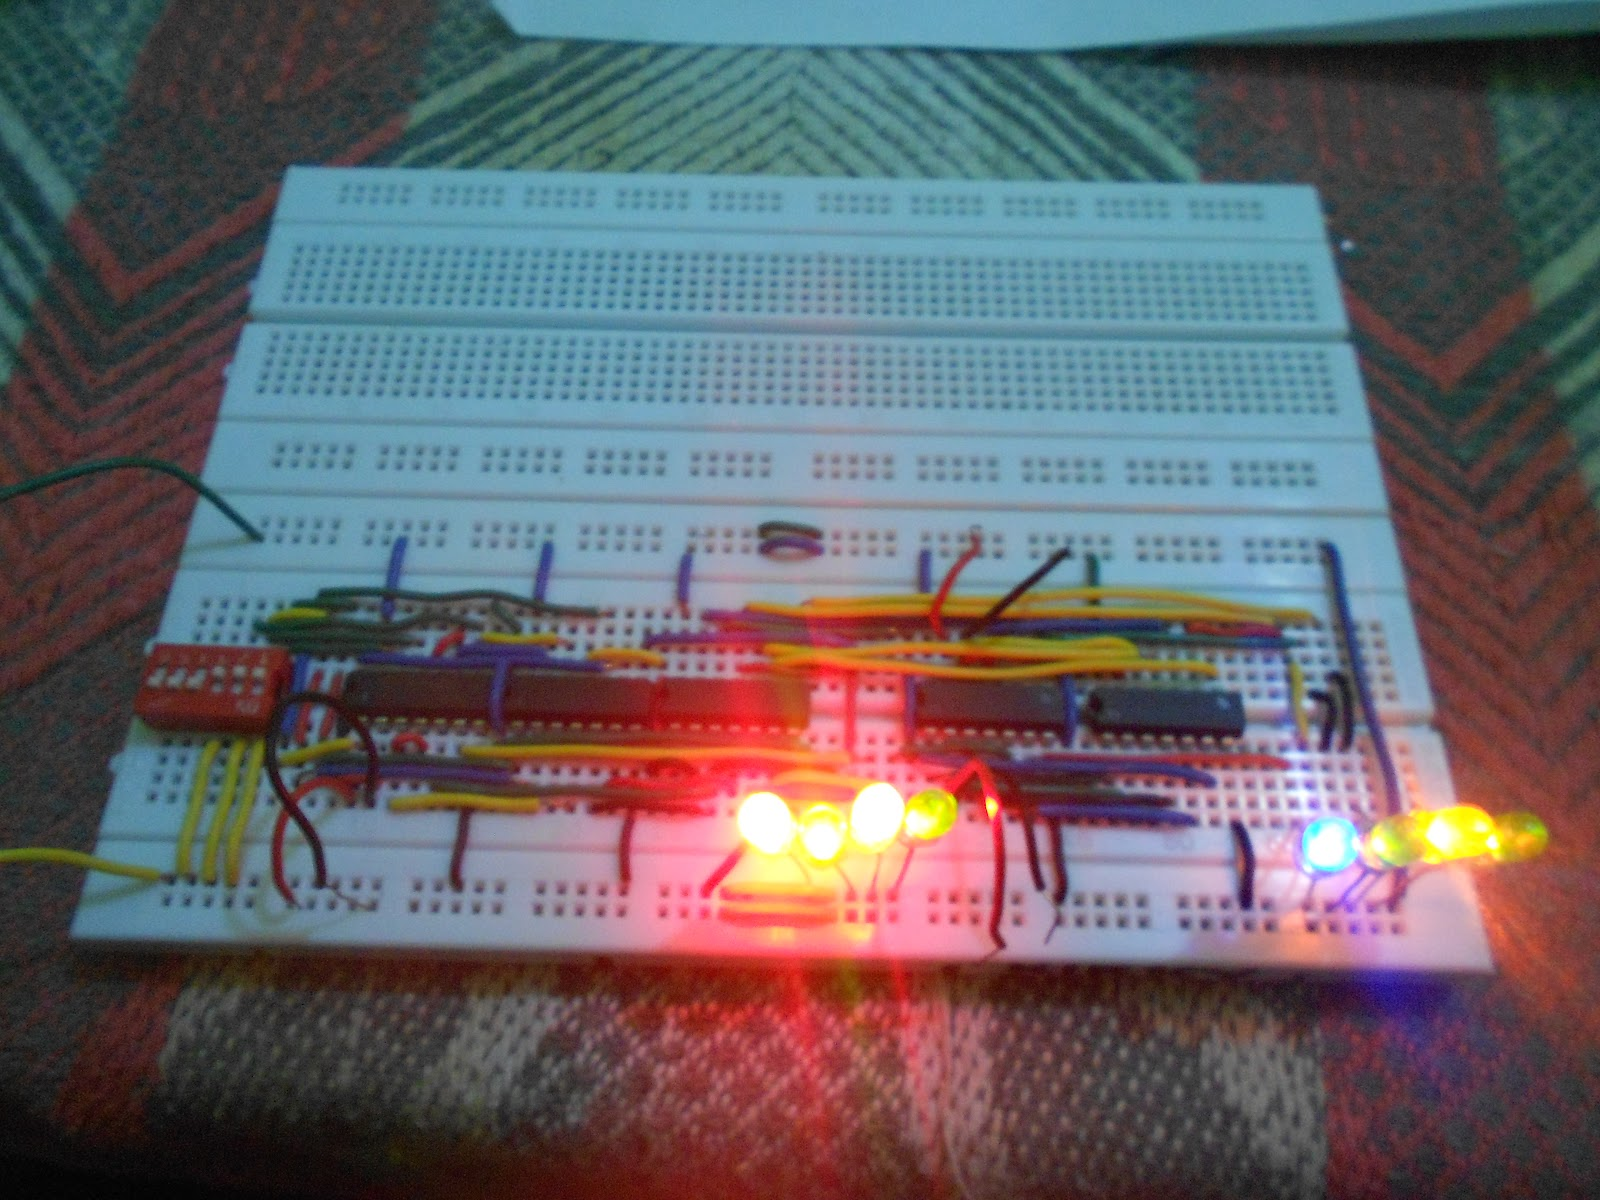 8 Bit Magnitude Comparator Logic Diagram Convergent Boundary Ece Circuit Full Adder